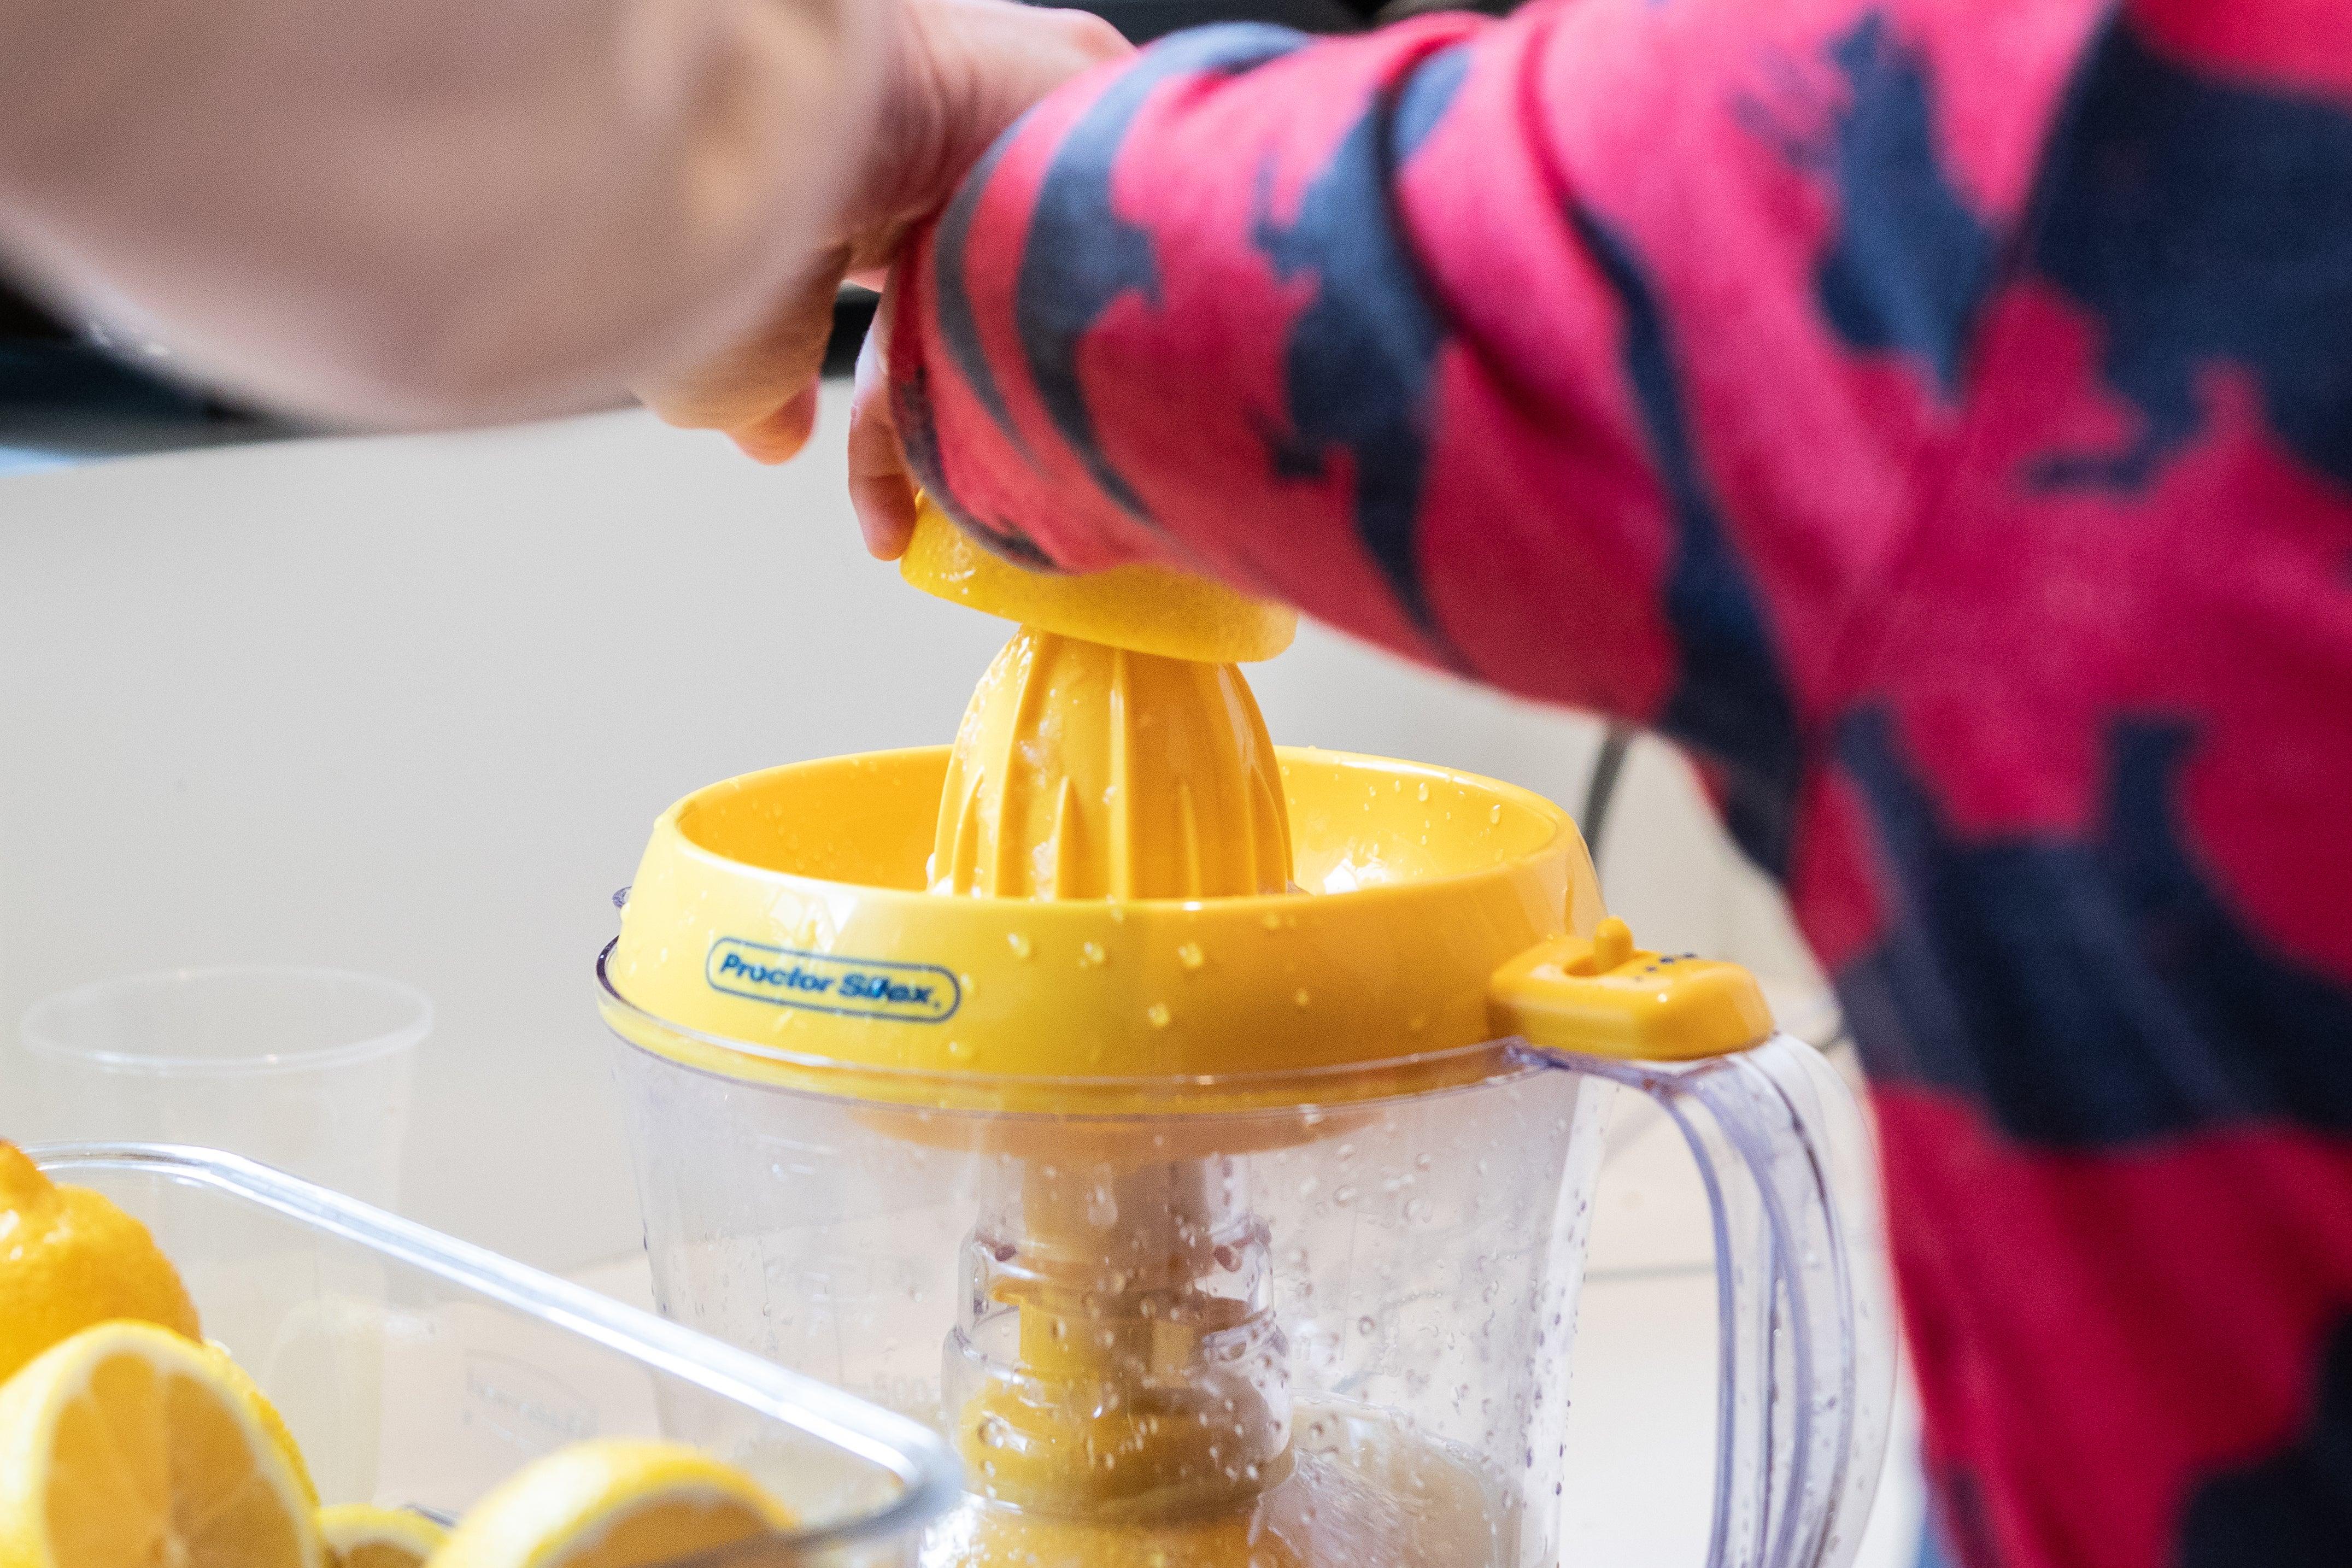 Proctor Silex Alex's Lemonade Stand Citrus Juicer